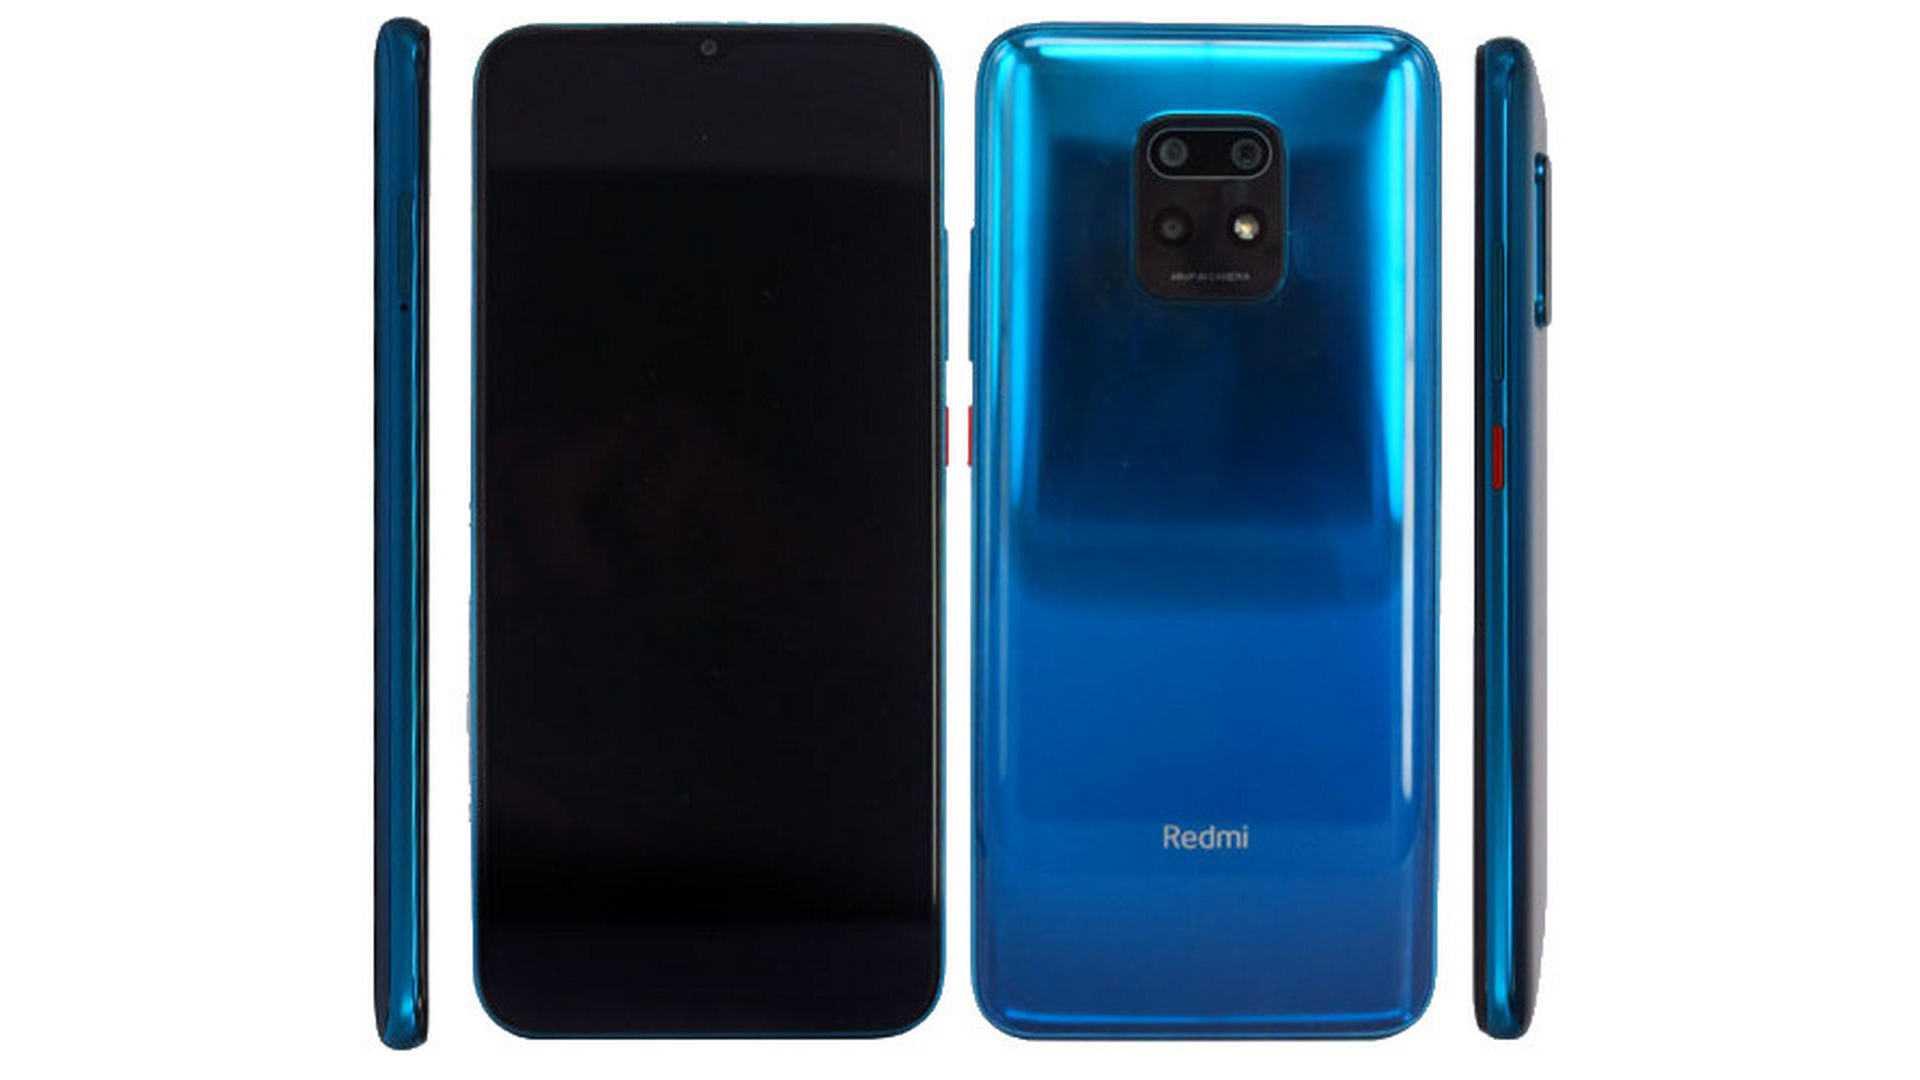 Redmi note 7 камера: фото, обзор, отзывы и тест с примерами